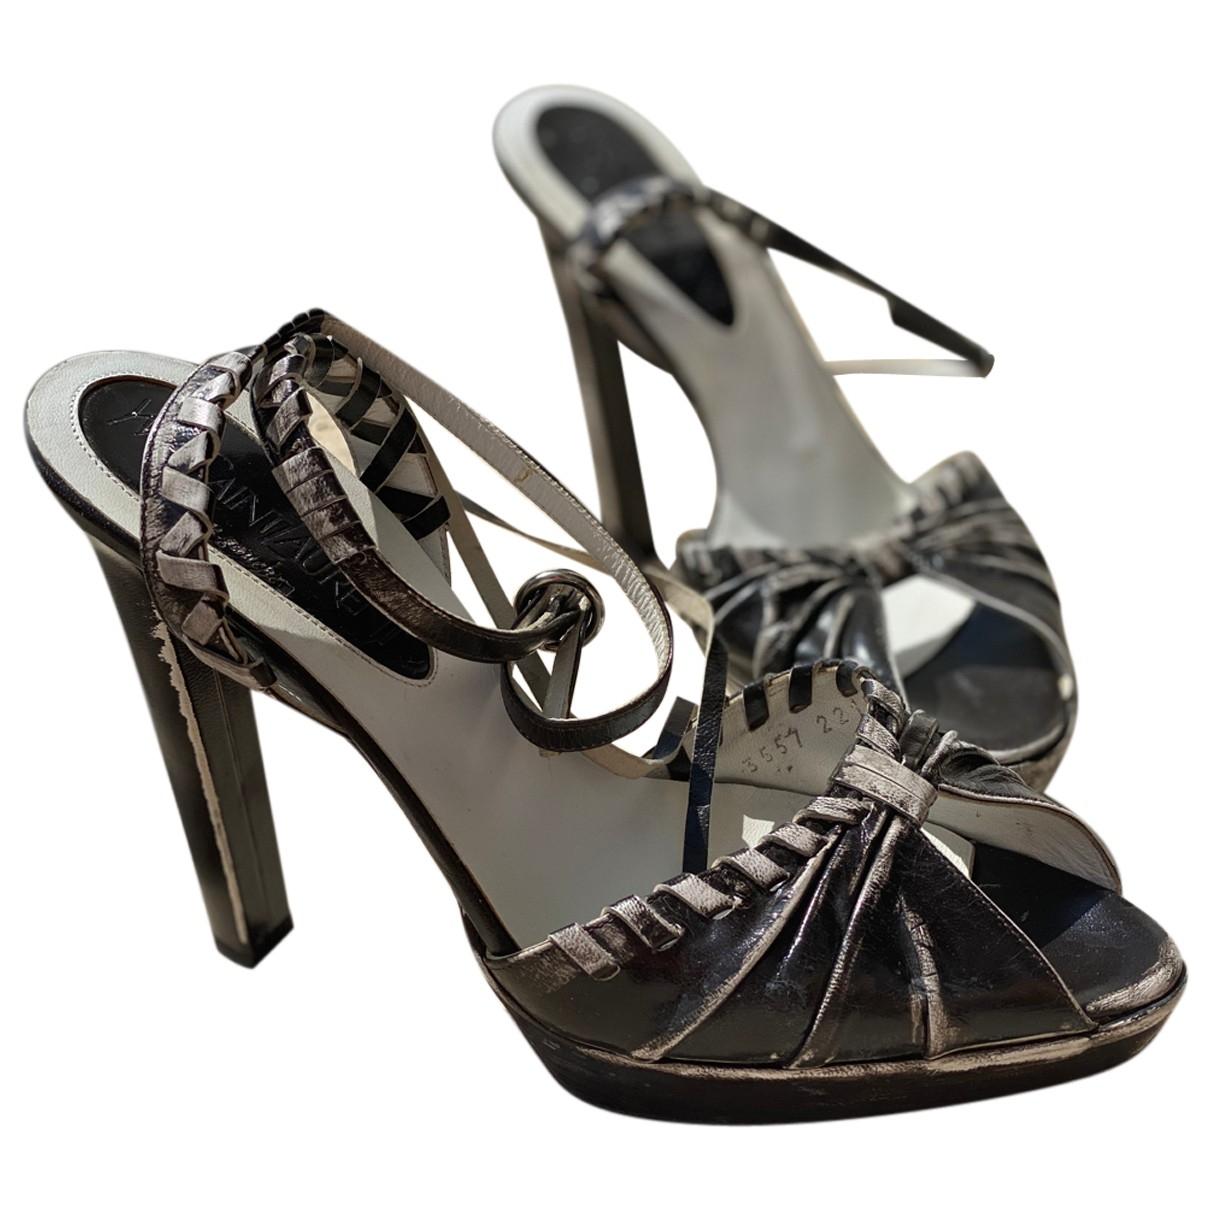 Yves Saint Laurent \N Black Leather Sandals for Women 39 EU